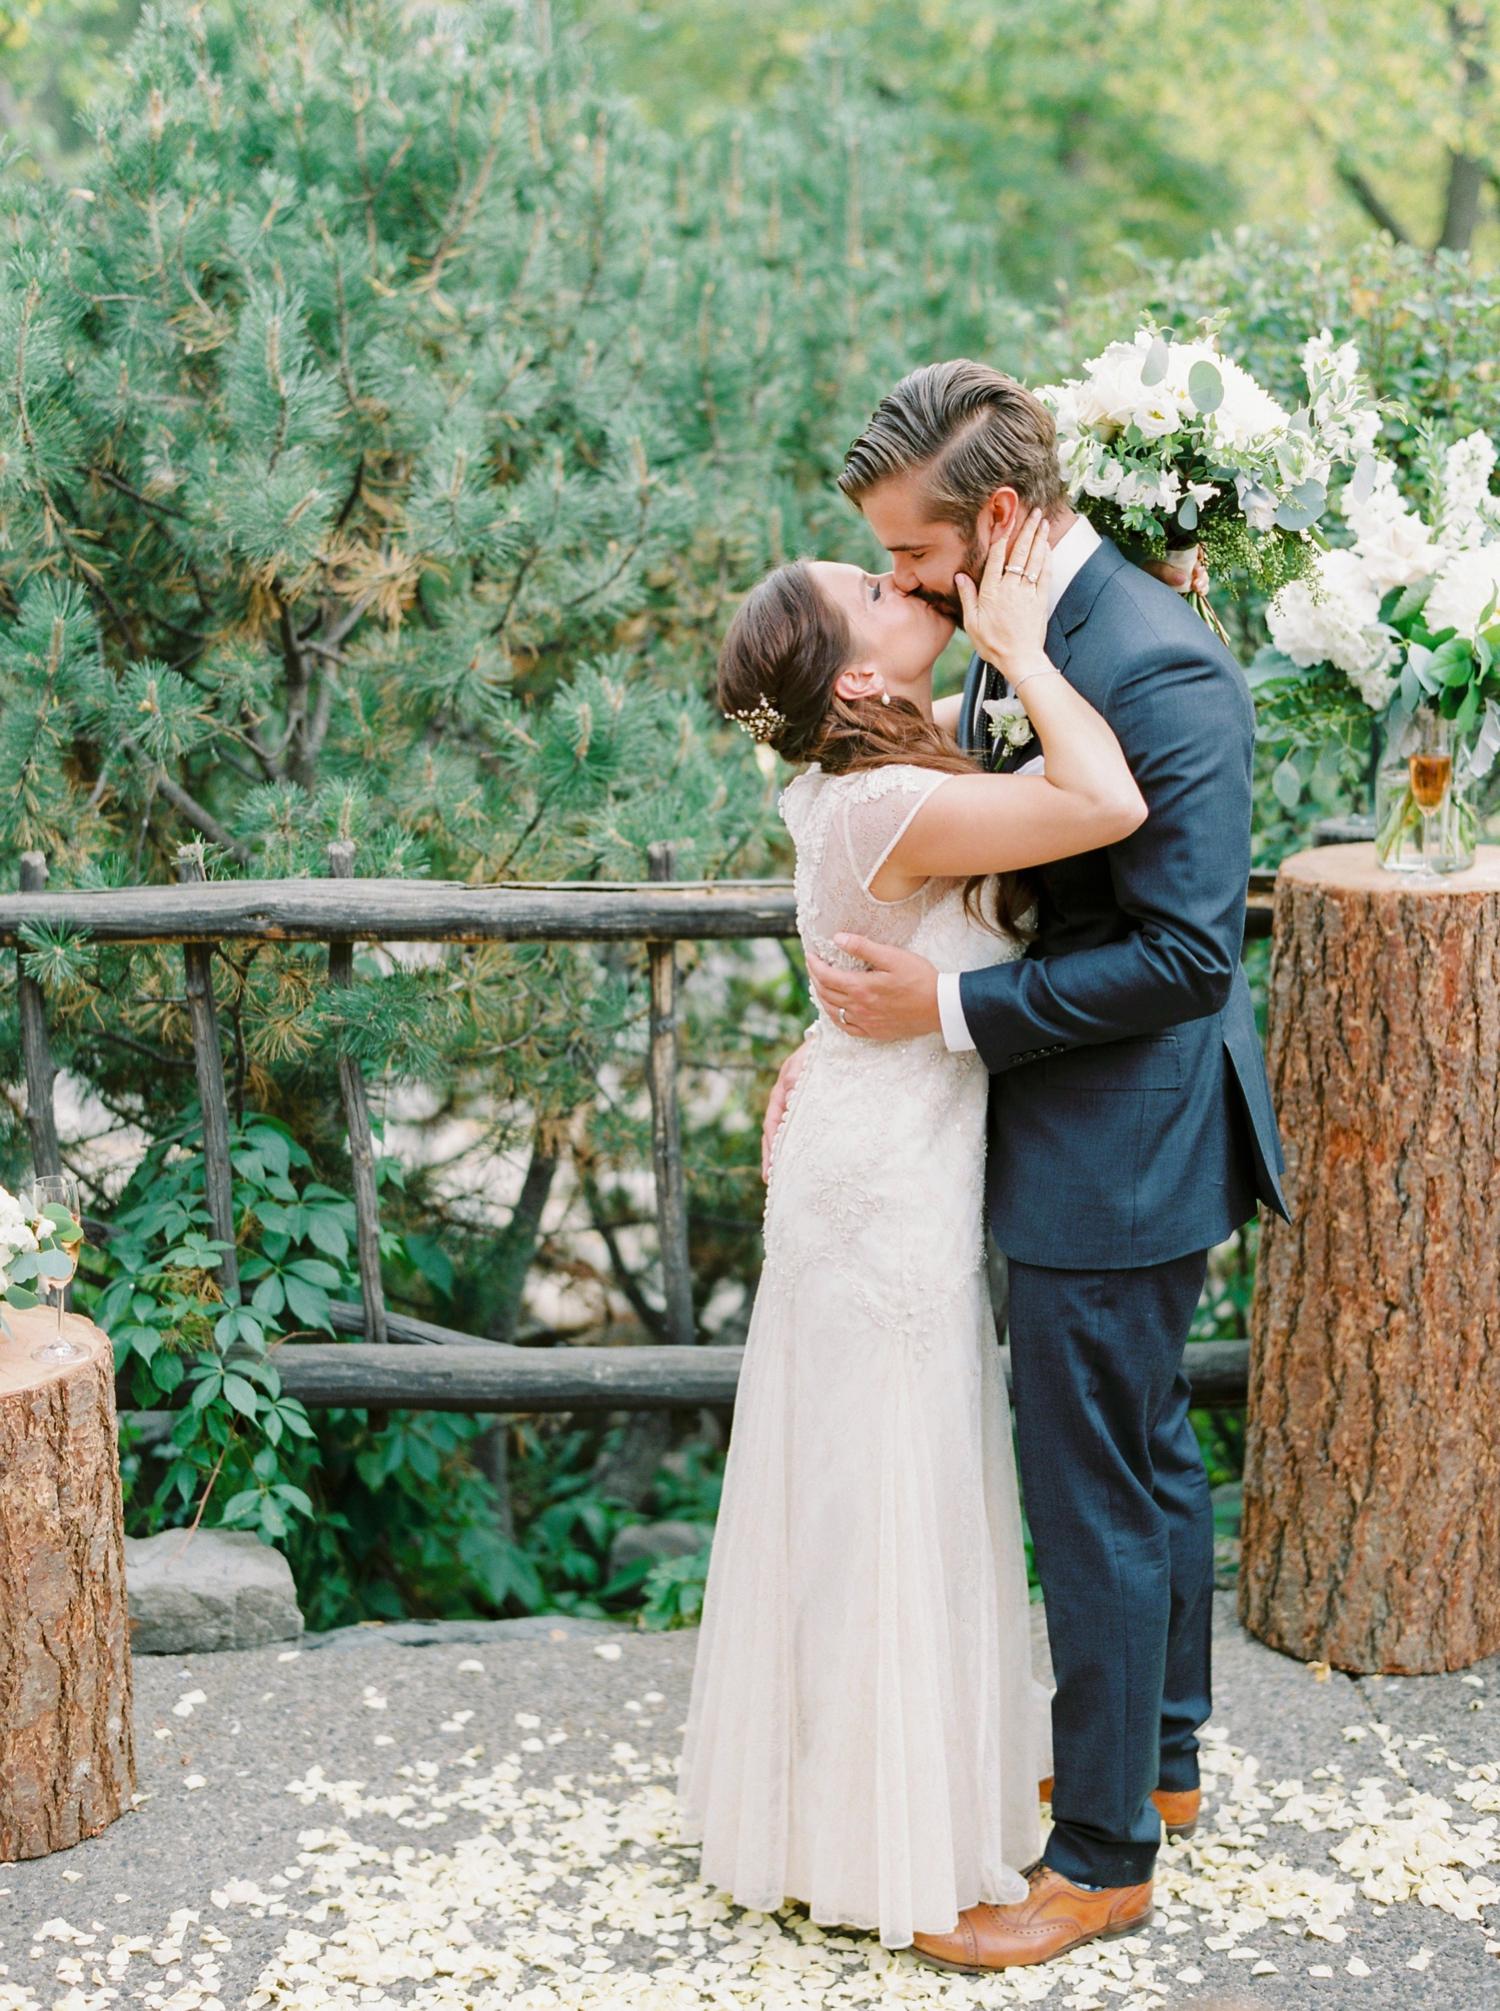 Calgary wedding photographers | fine art film | Justine Milton Photography | wedding inspiration | wedding chairs | wedding flowers | wedding ceremony | bride and groom | kiss the bride